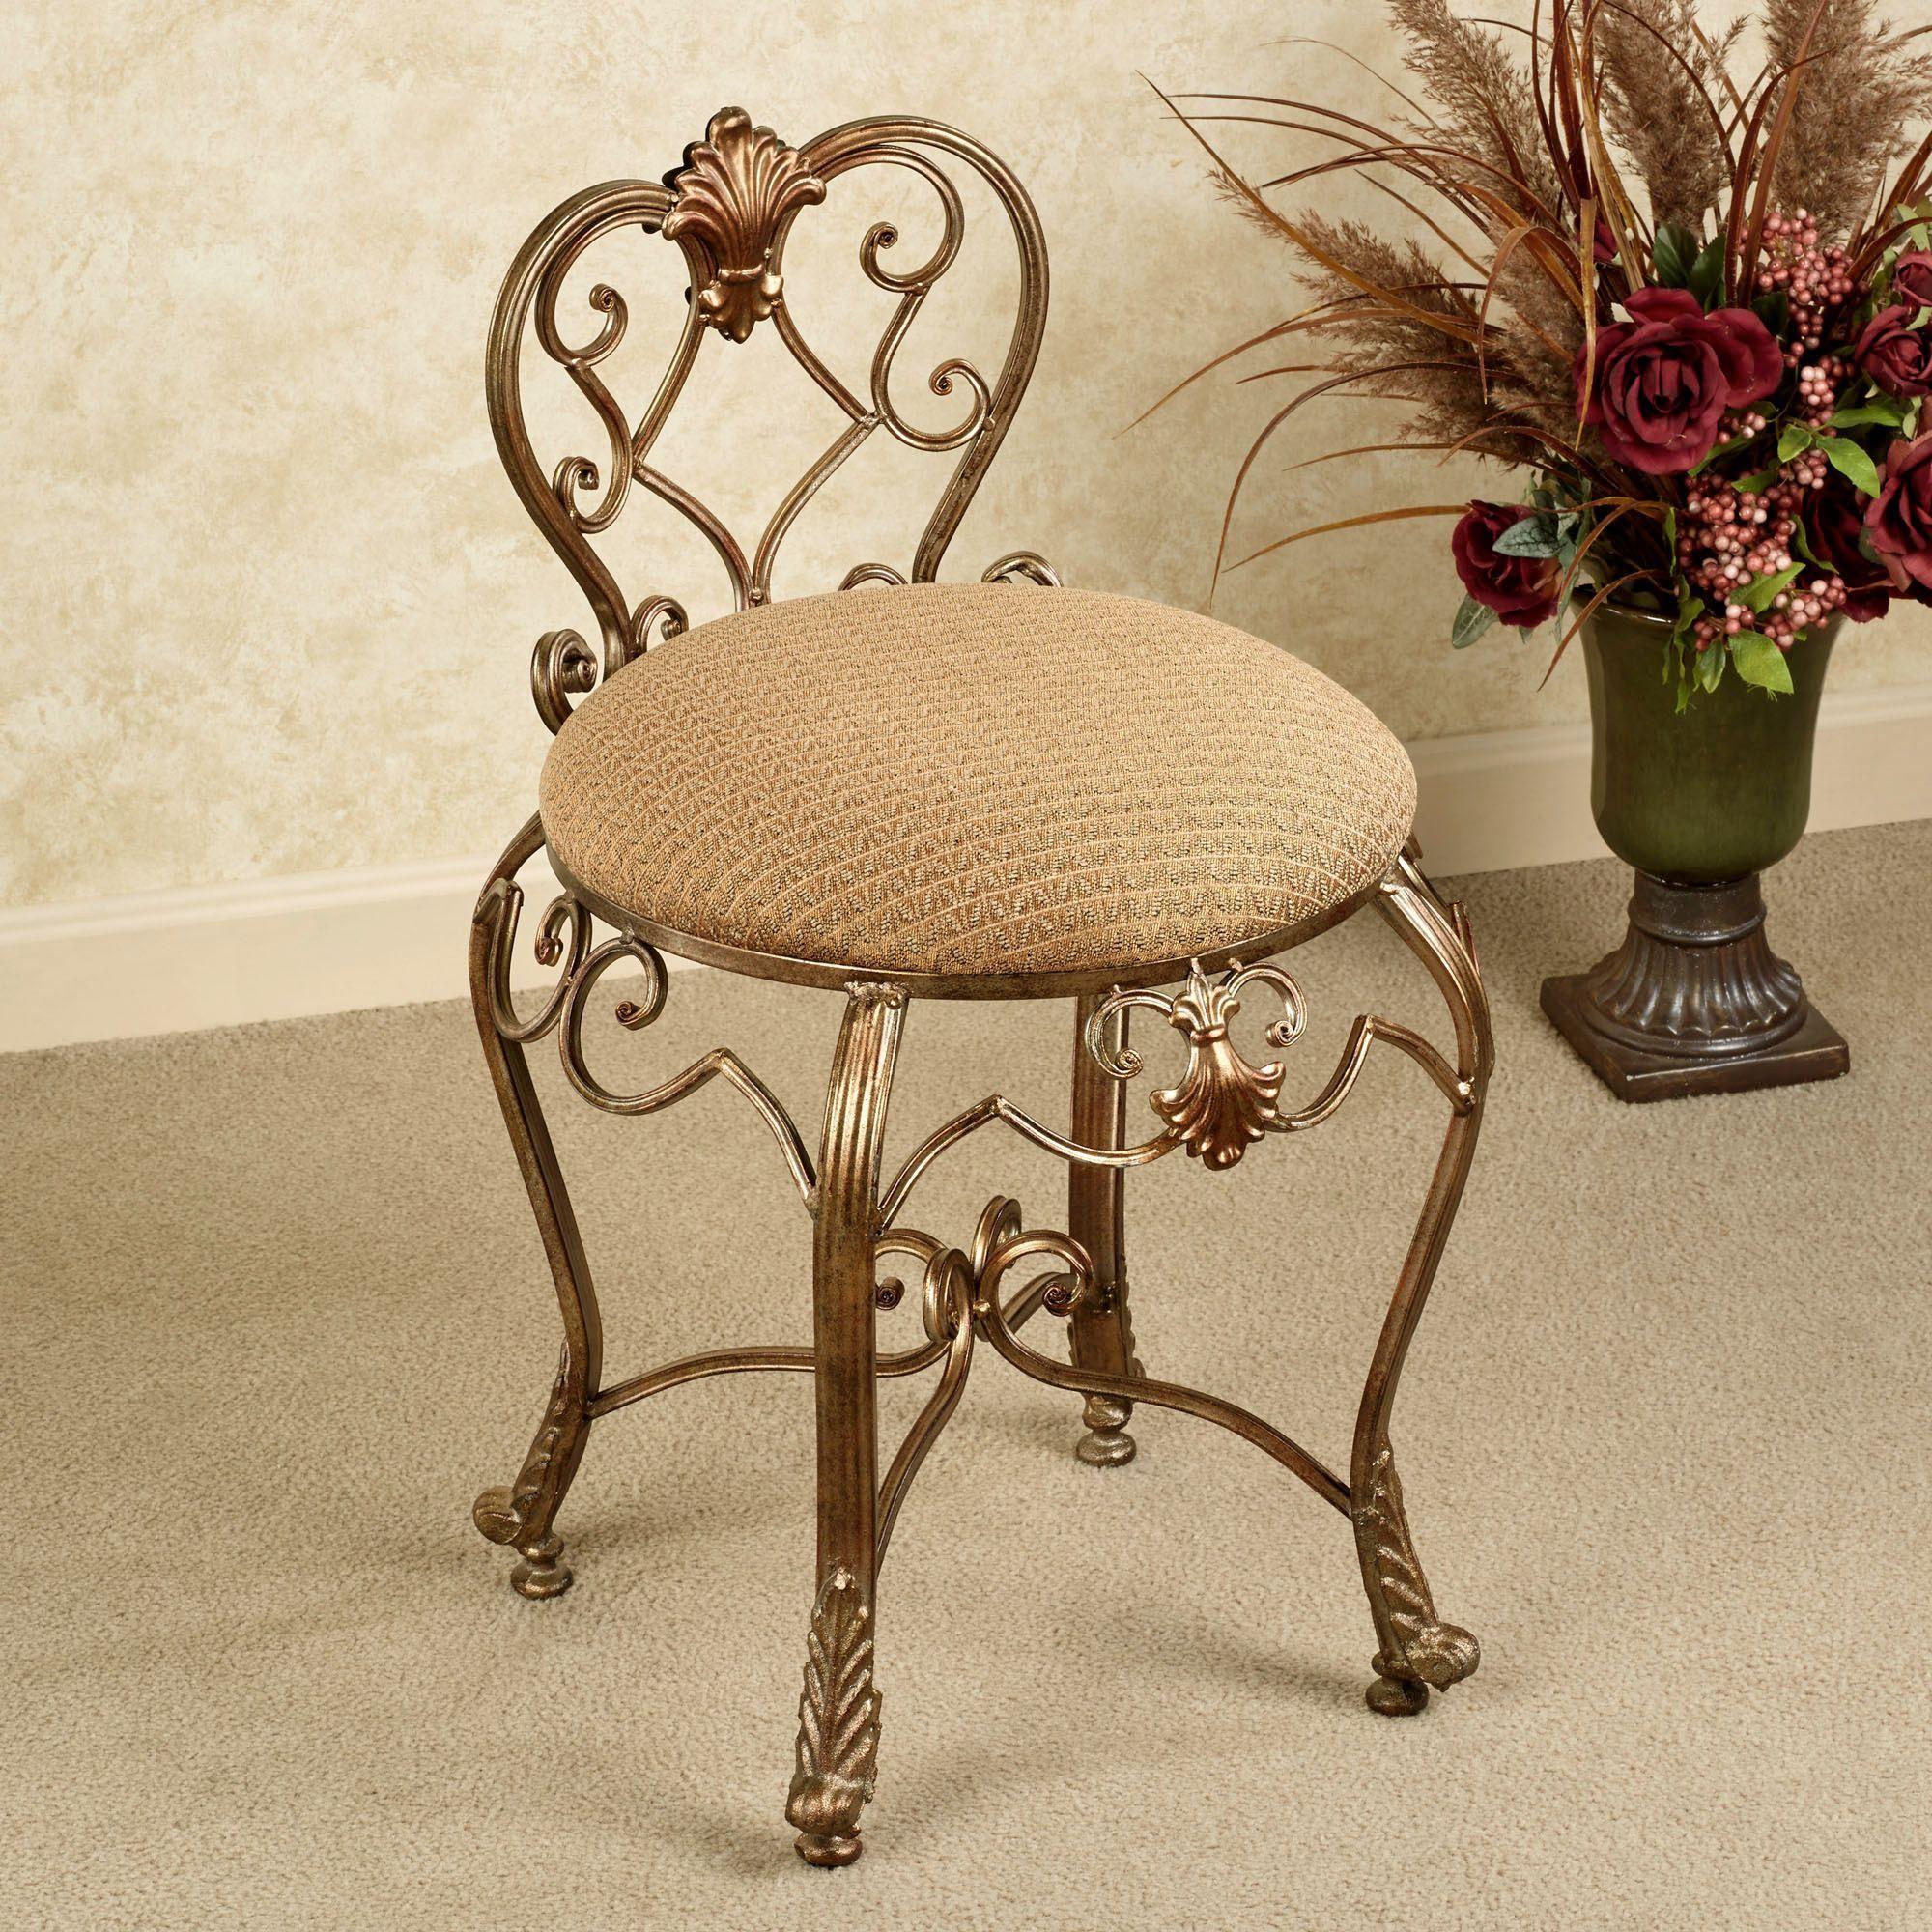 dining mercer dp com chairs fuchsia safavieh collection georgia stool vanity amazon kitchen